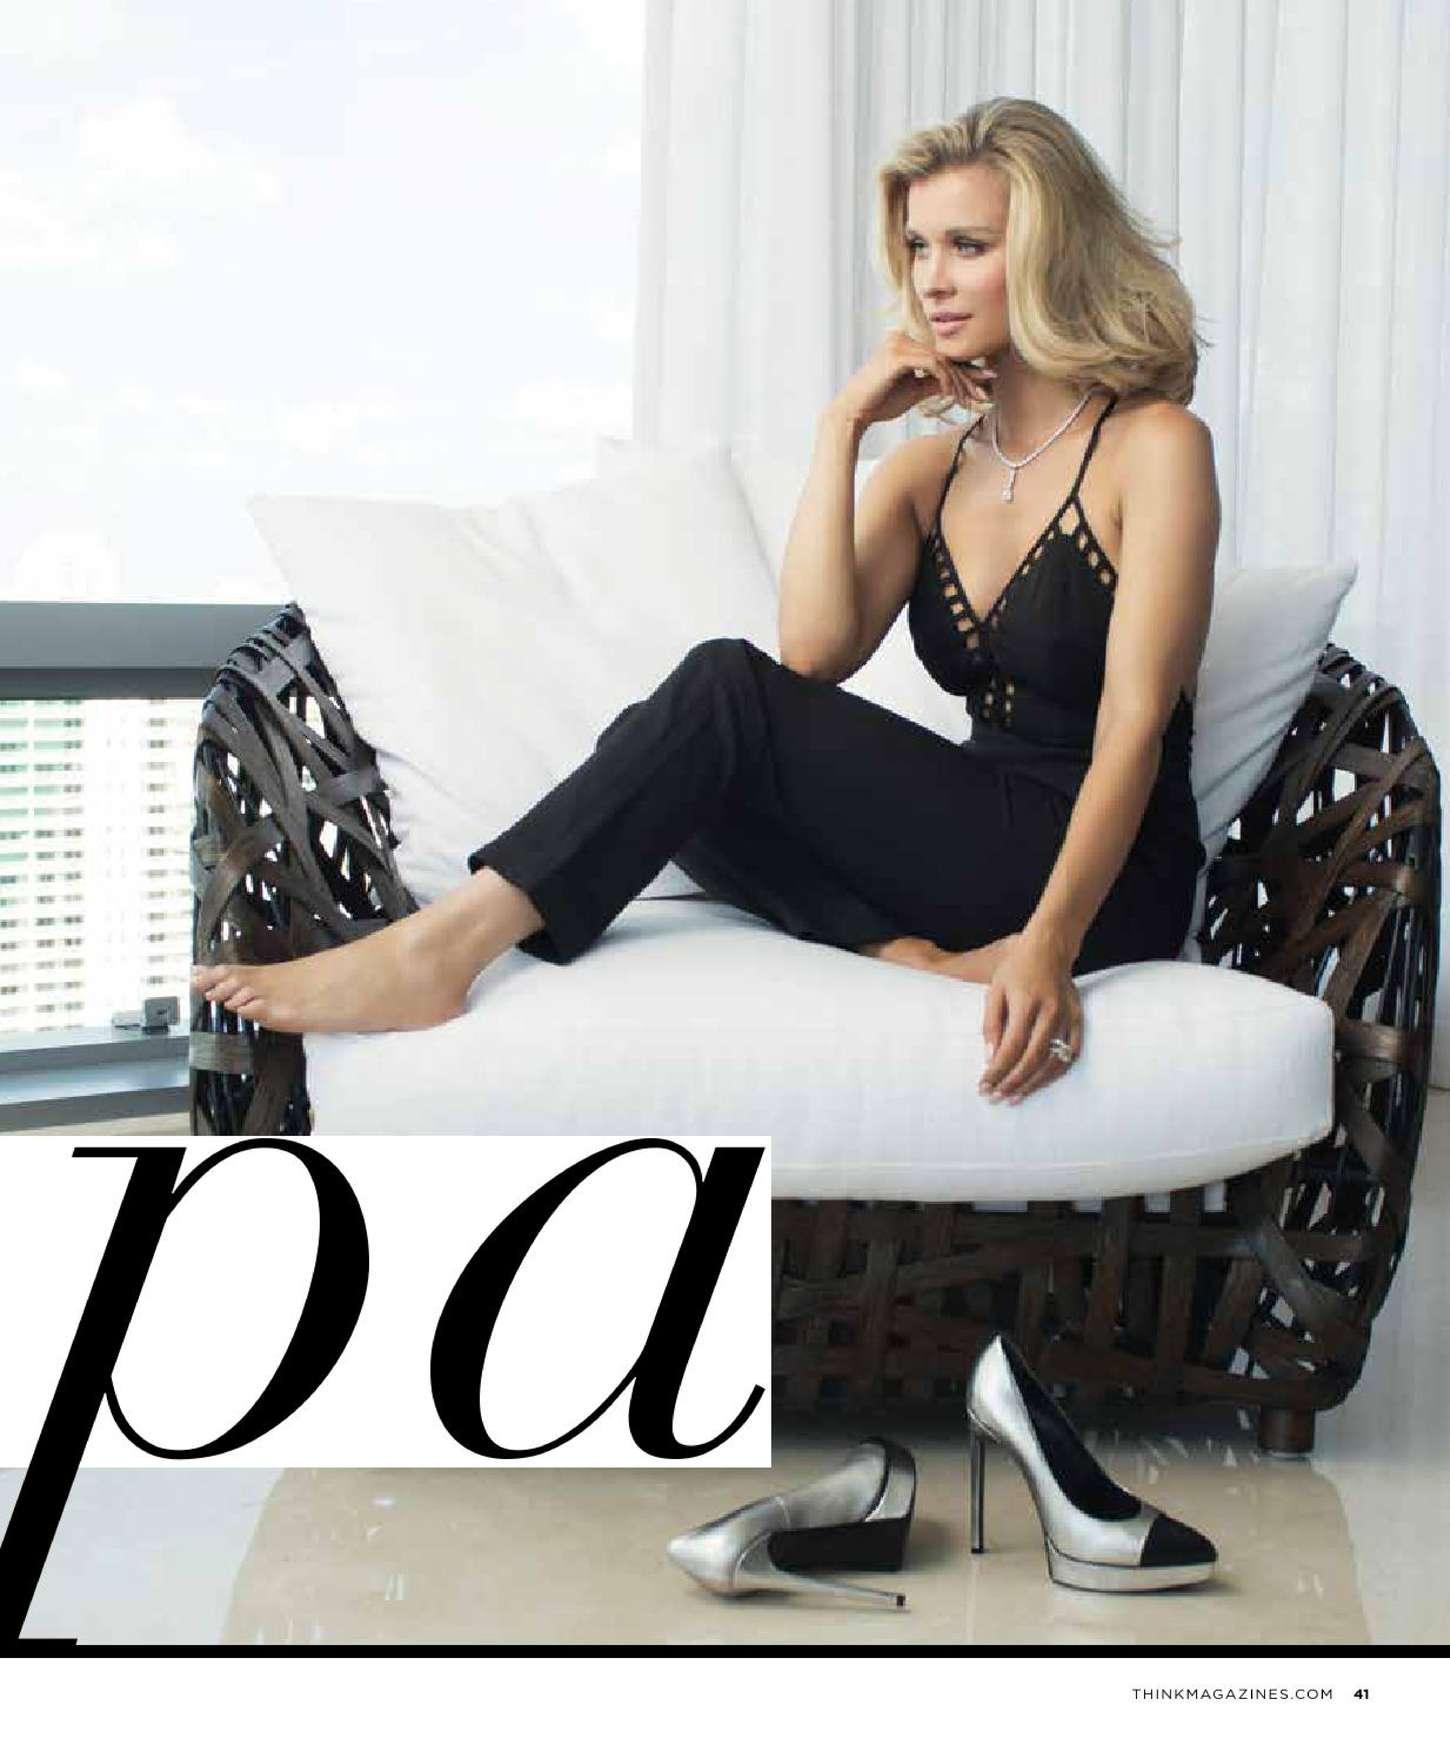 Joanna Krupa 2015 : Joanna Krupa: THINK Magazine 2015 -04